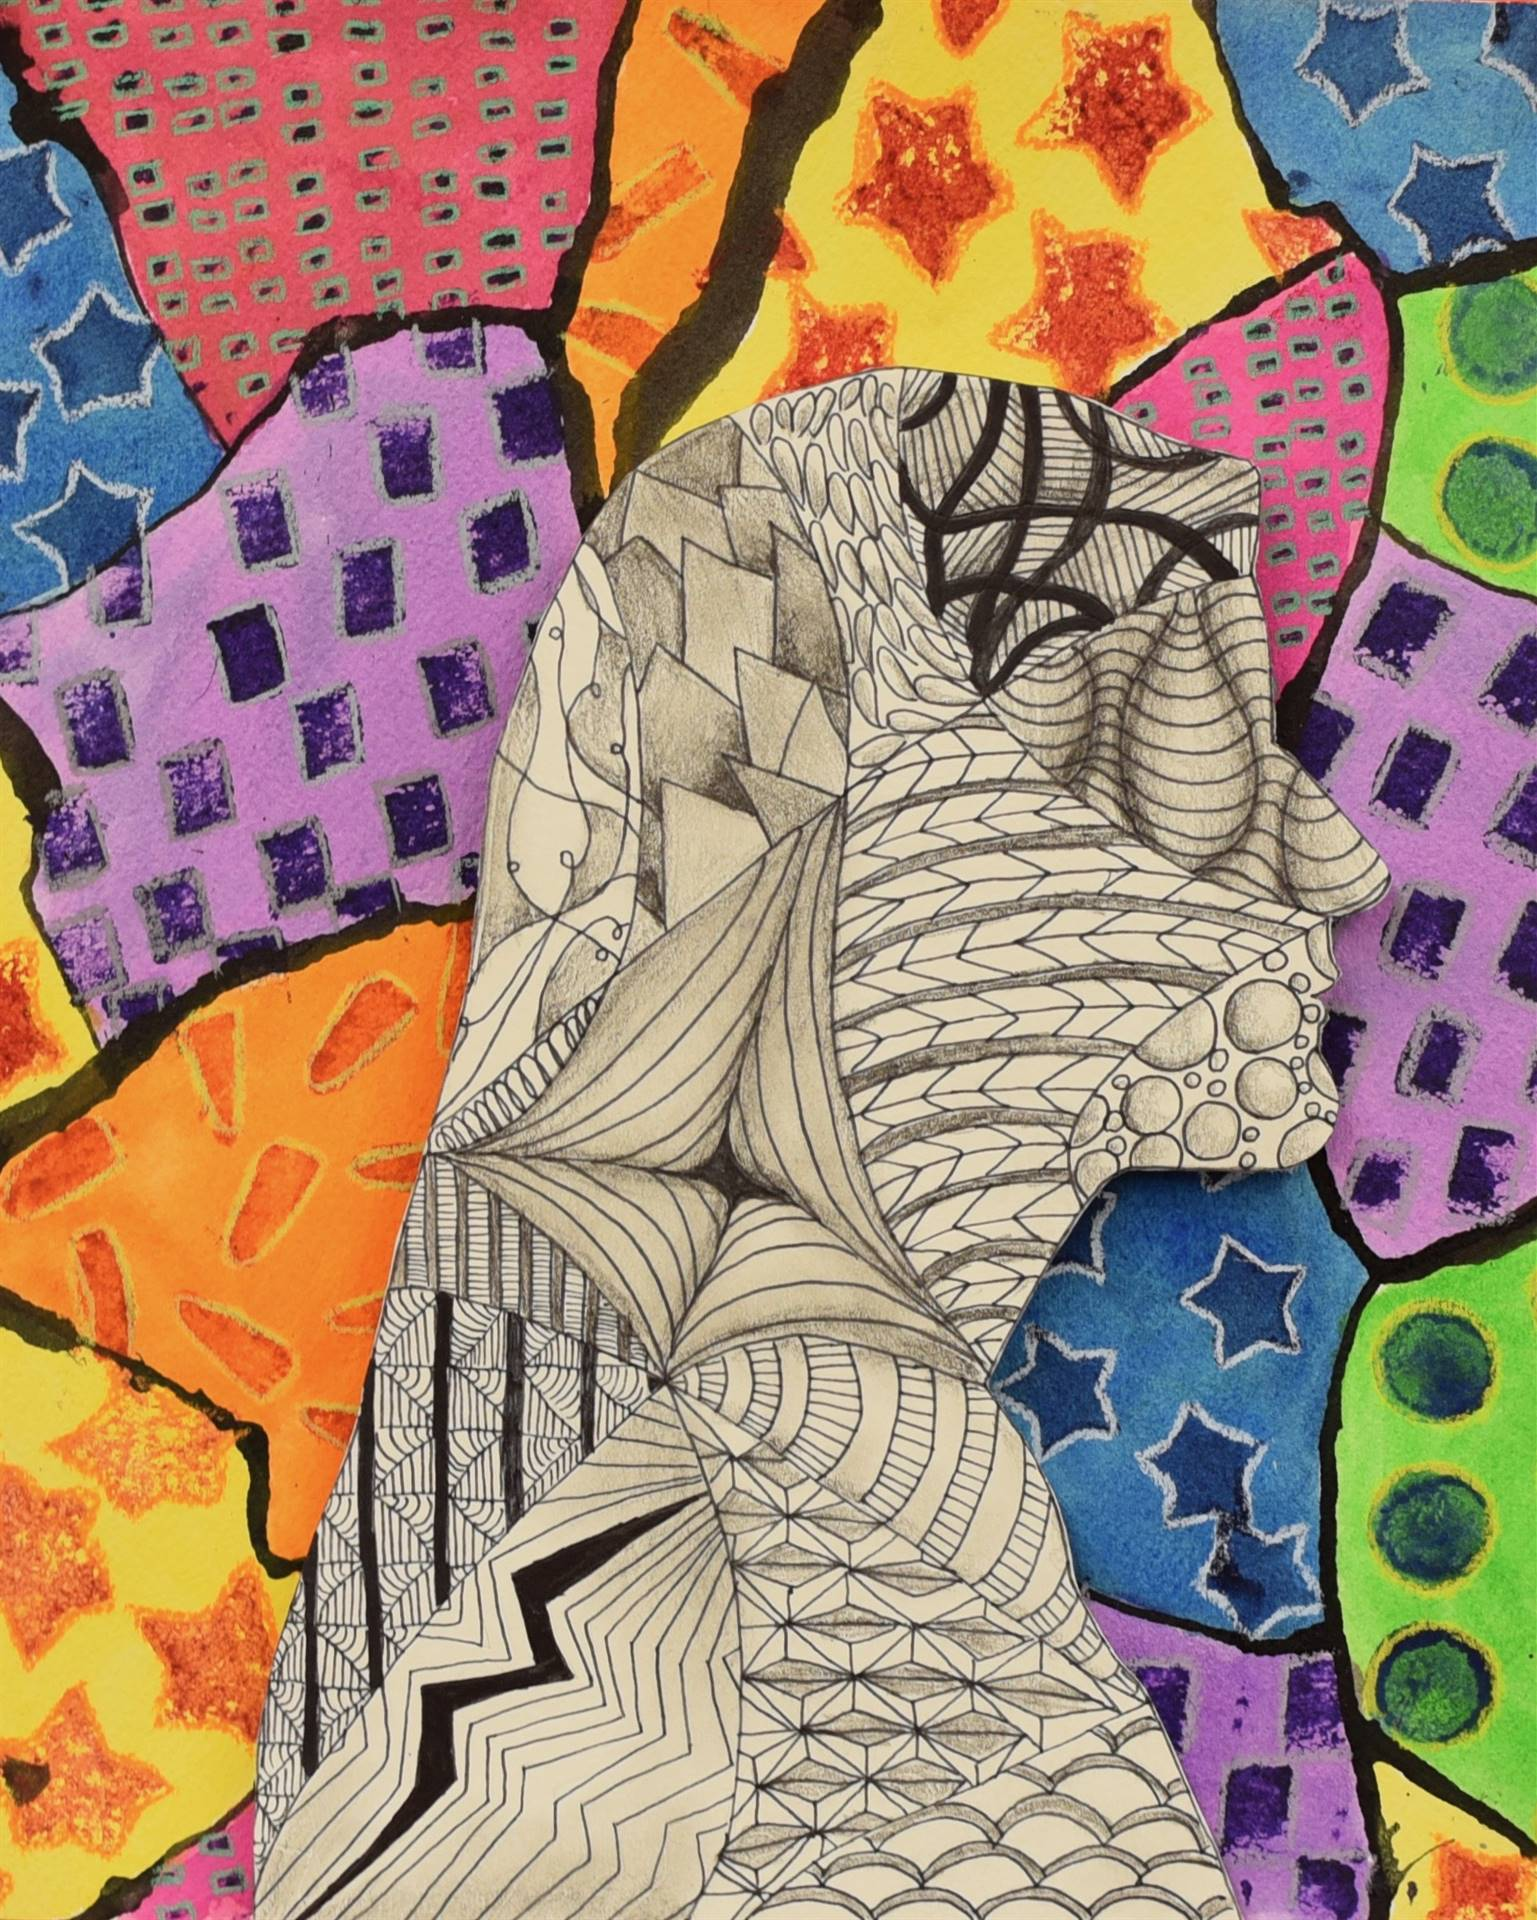 Brecksville-Broadview Hts. Middle School Art Projects 29